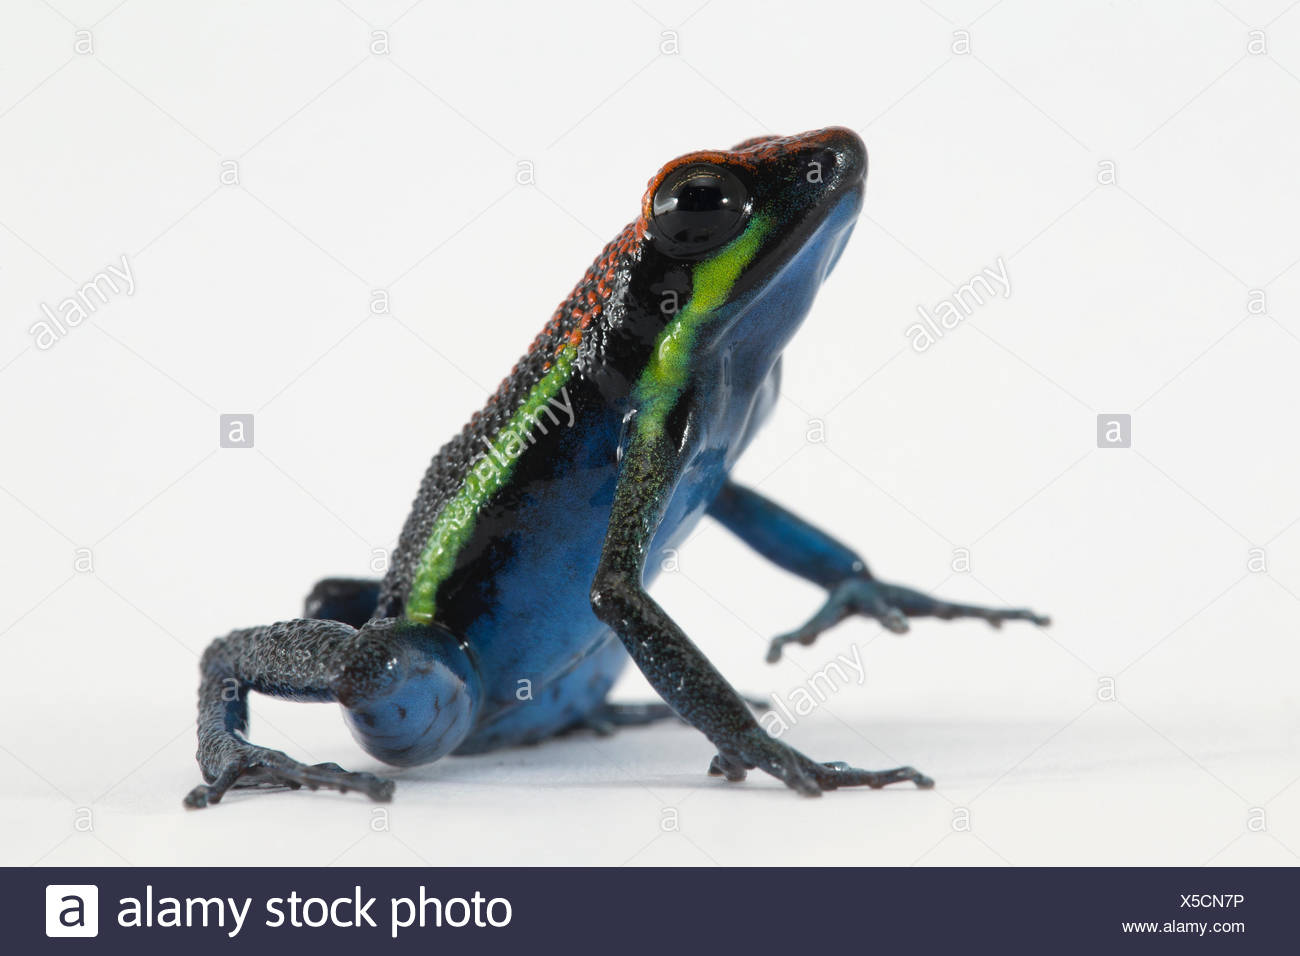 A new species of poison dart frog belonging to the genus Ameerega. - Stock Image